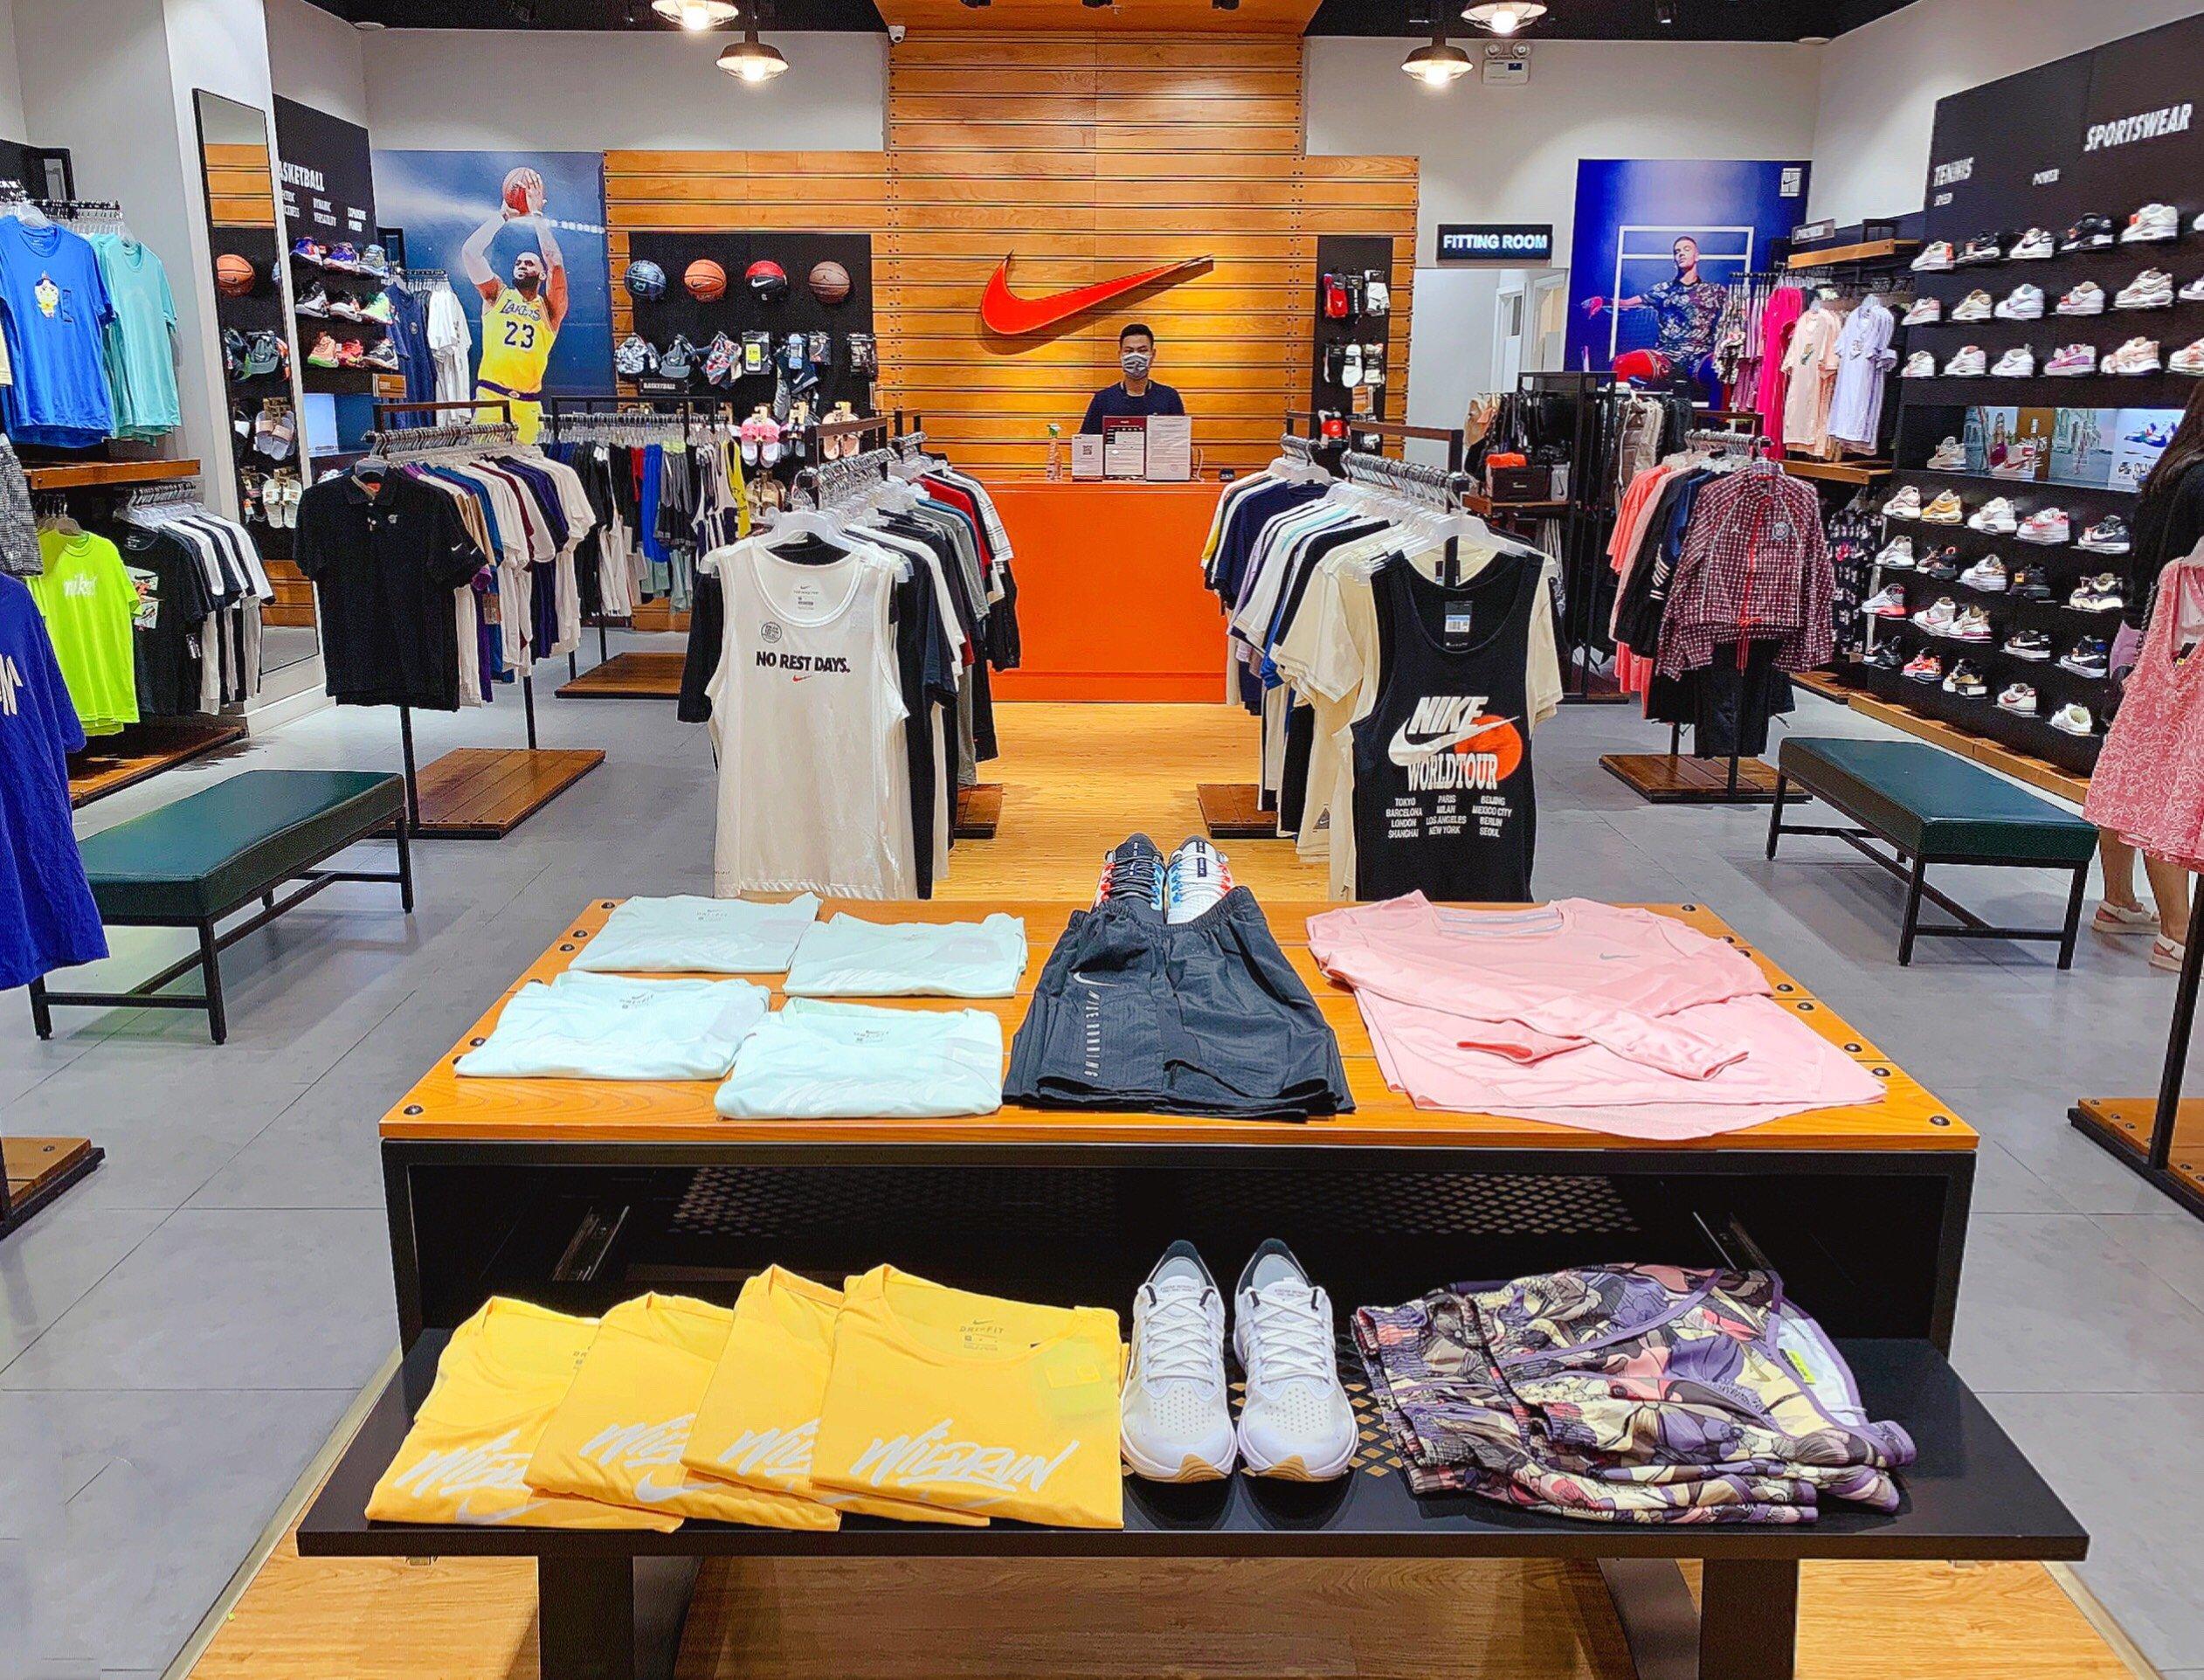 Nike trải nghiệm mua sắm xanh